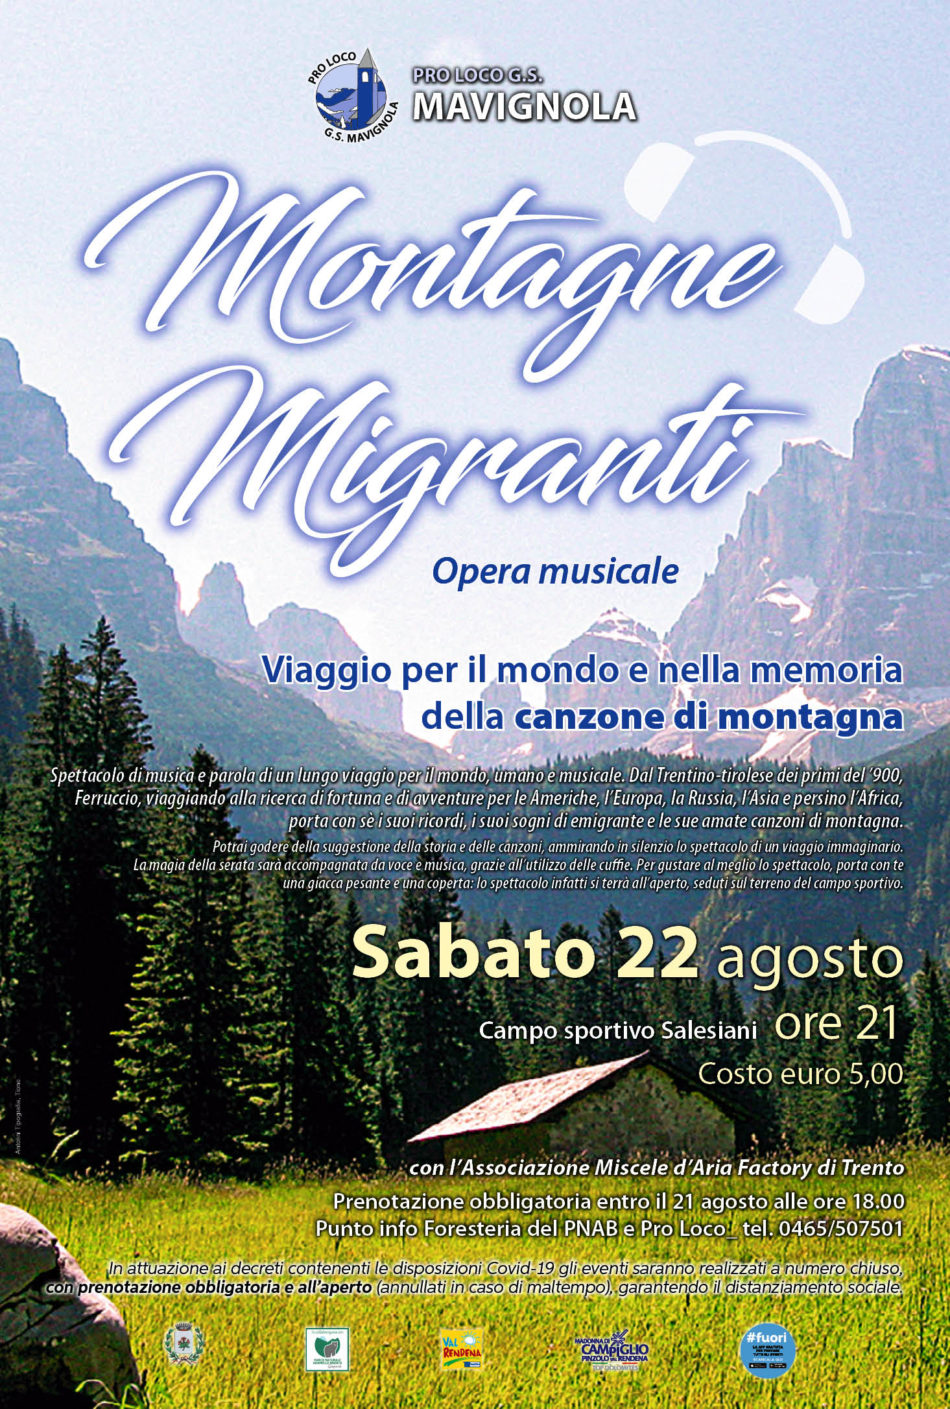 Mavignola, 22 agosto: Montagne Migranti